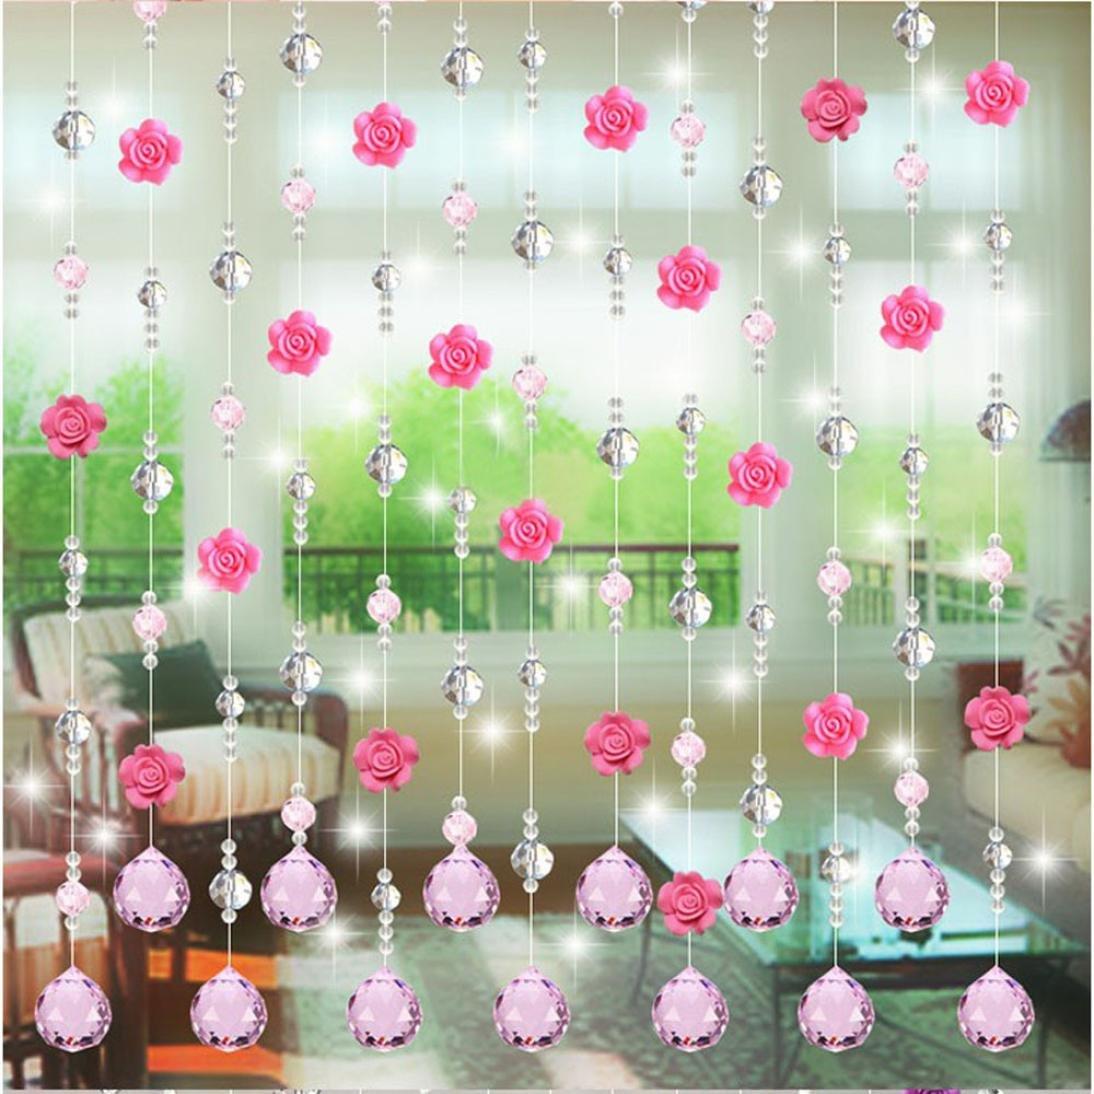 Coohole Crystal Glass Rose Bead Curtain Living Room Bedroom Window Door Wedding Home Decor (B, With Pendants)